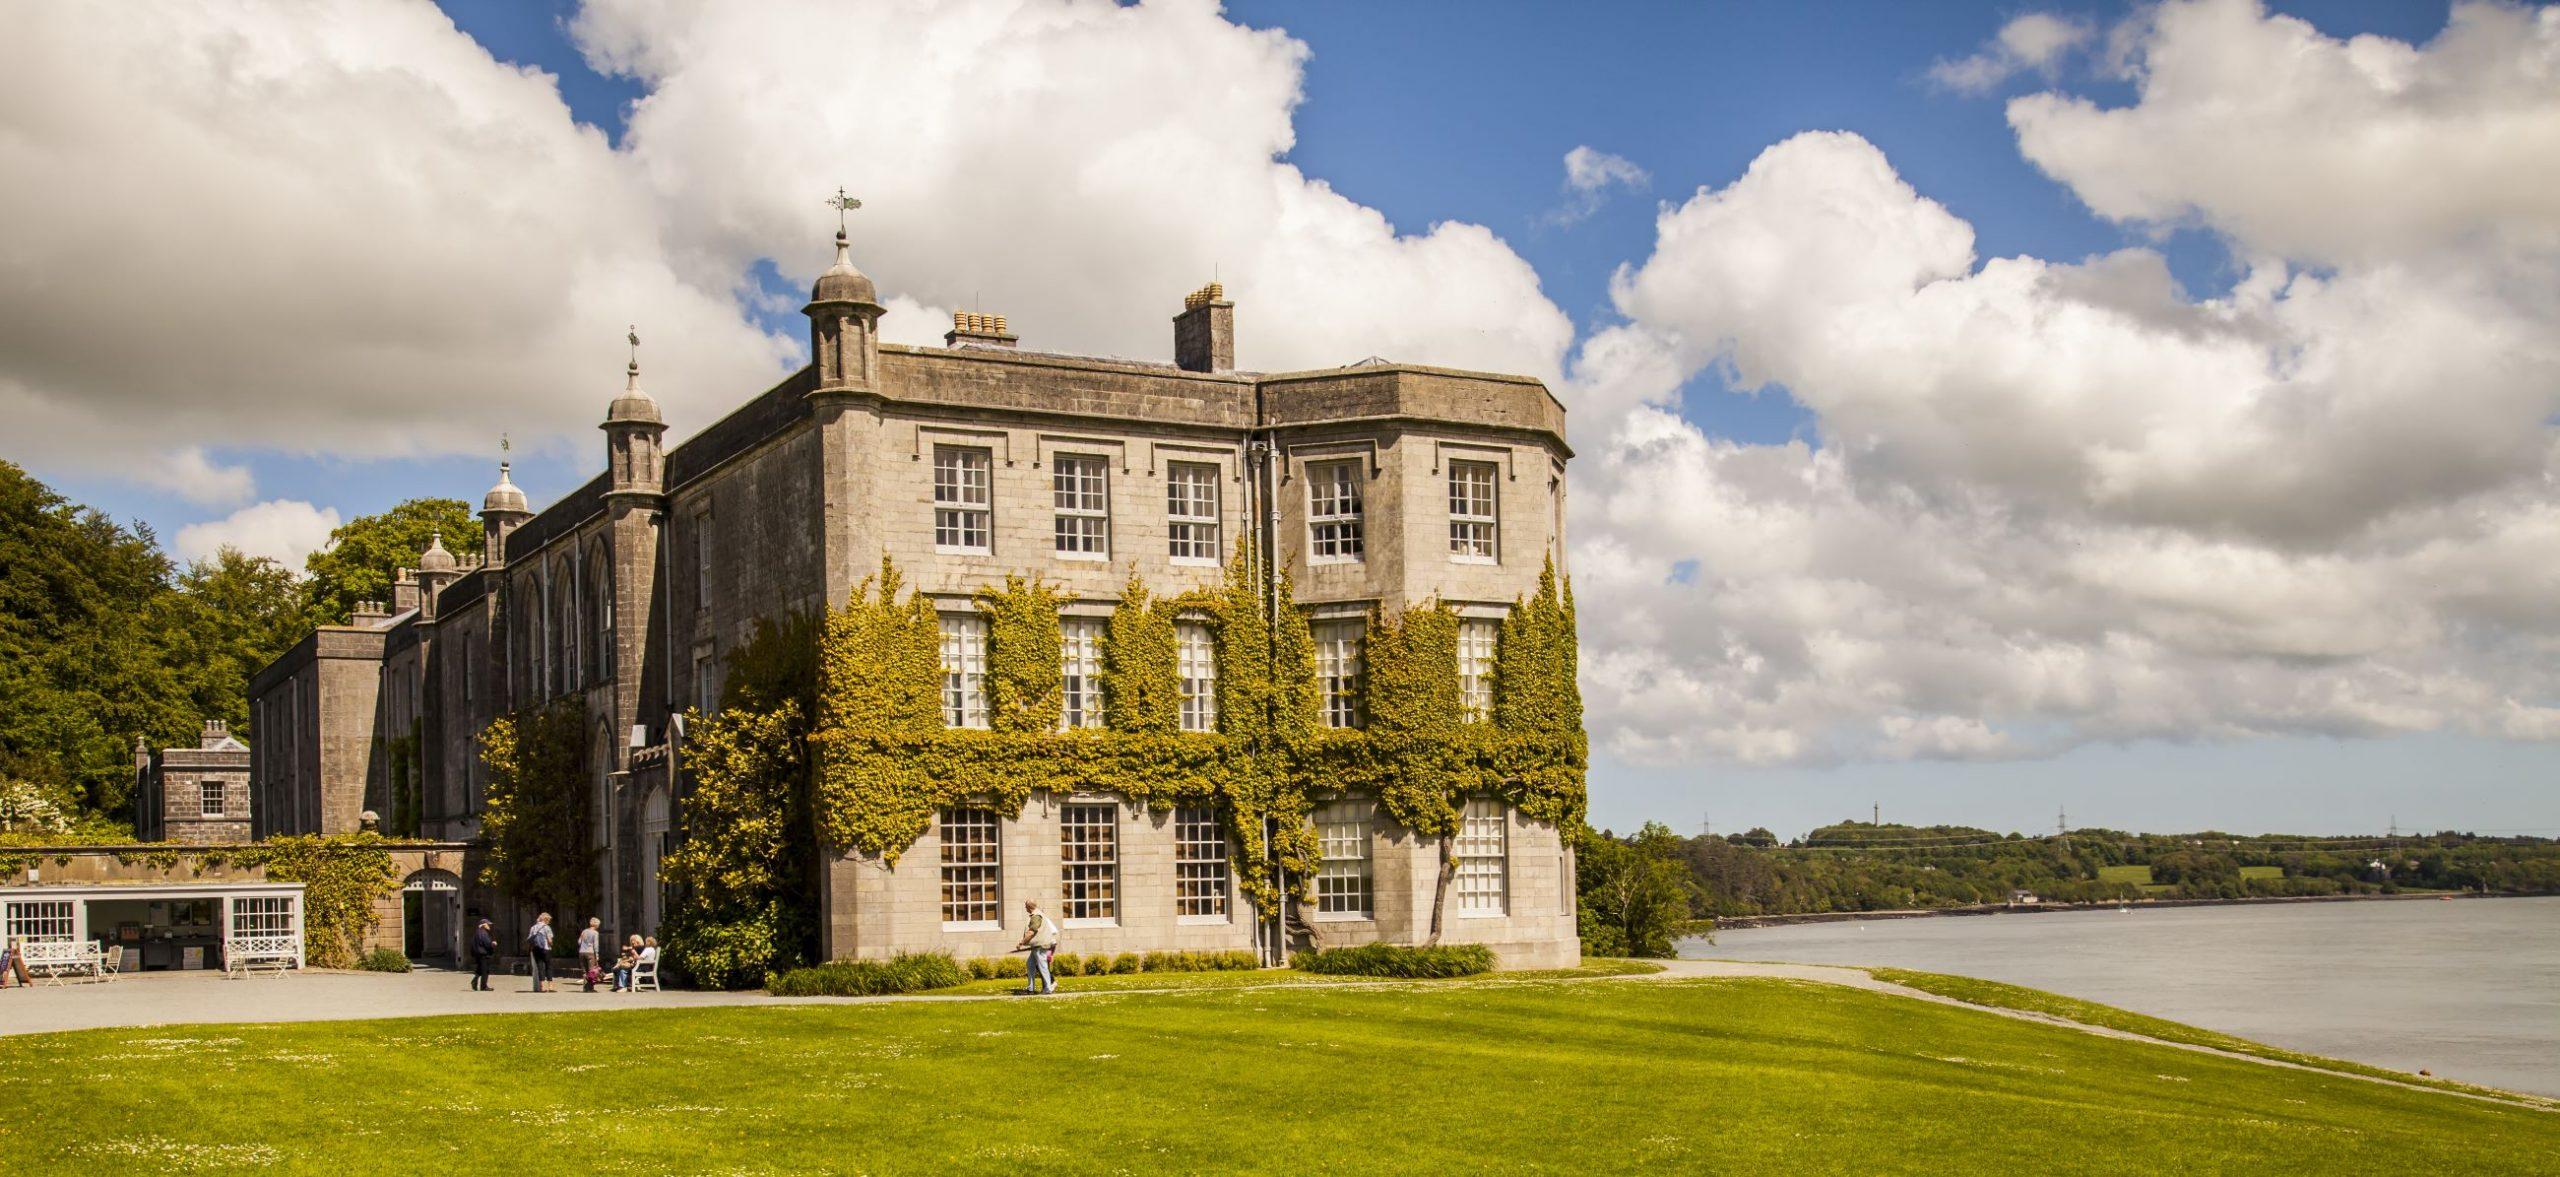 Plas Newydd House and Gardens, National Trust